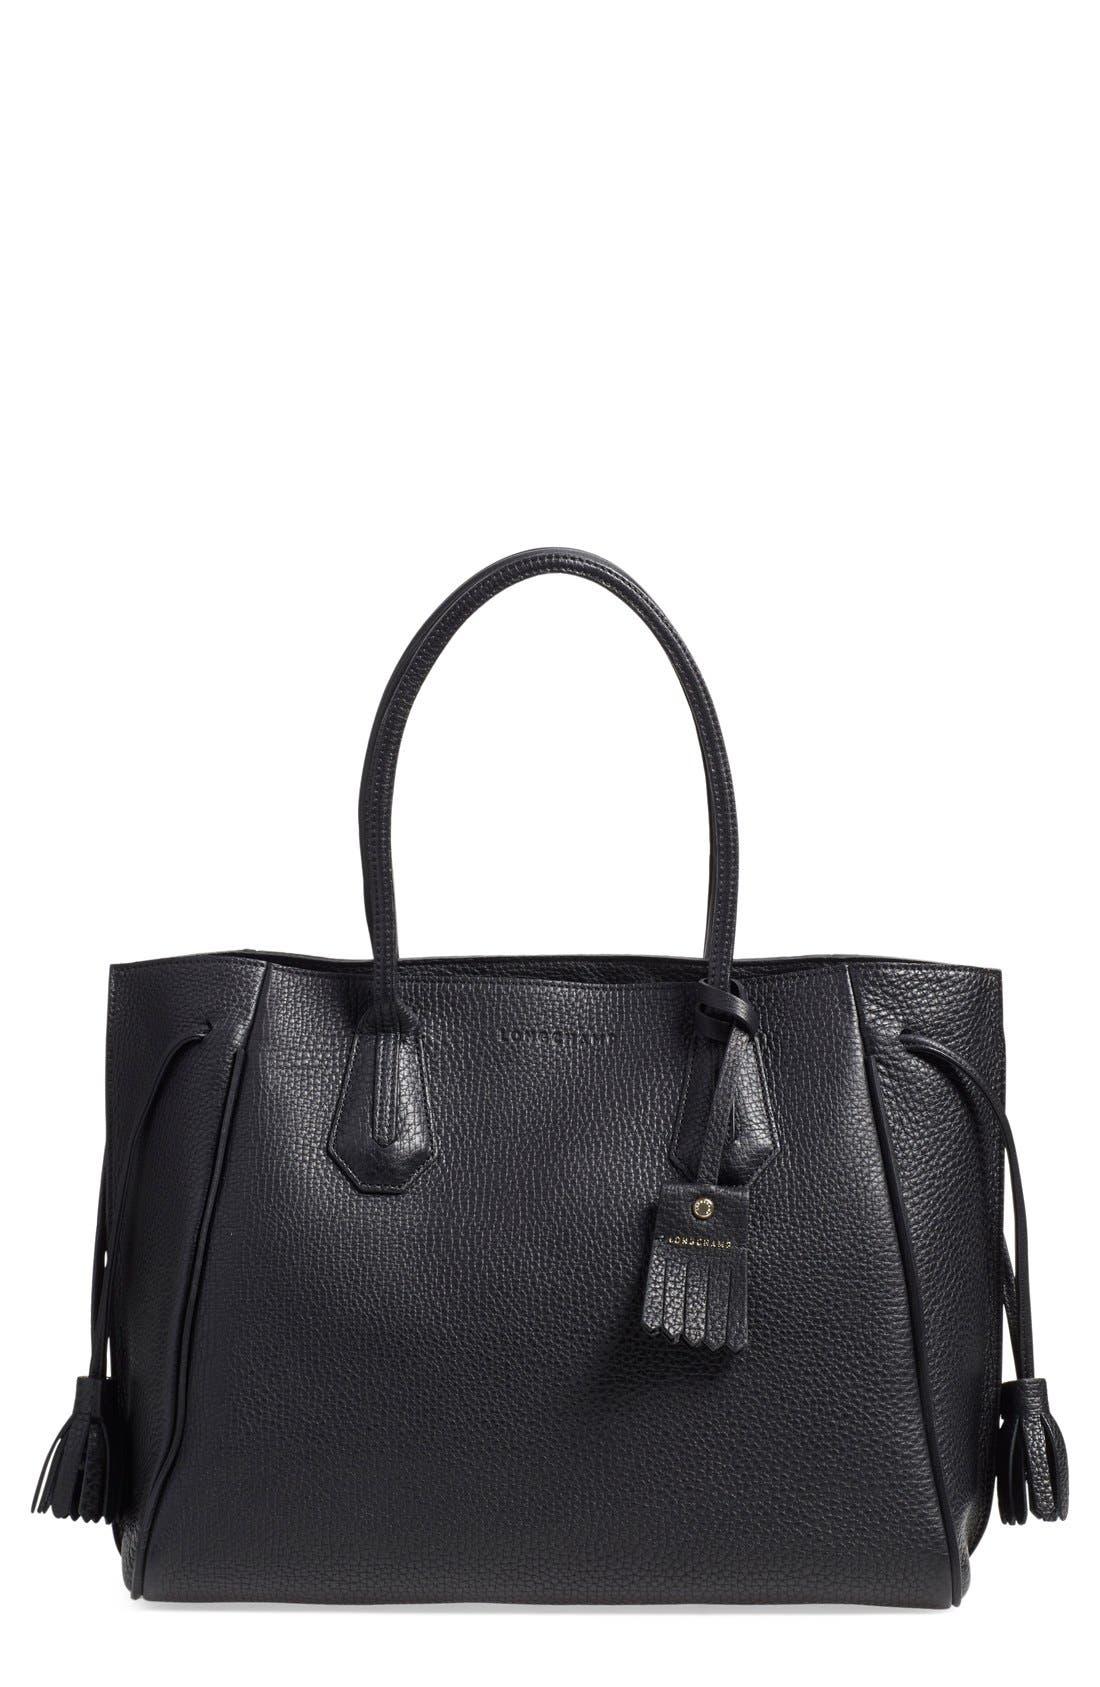 'Penelope' Tassel Drawstring Leather Tote,                         Main,                         color, BLACK